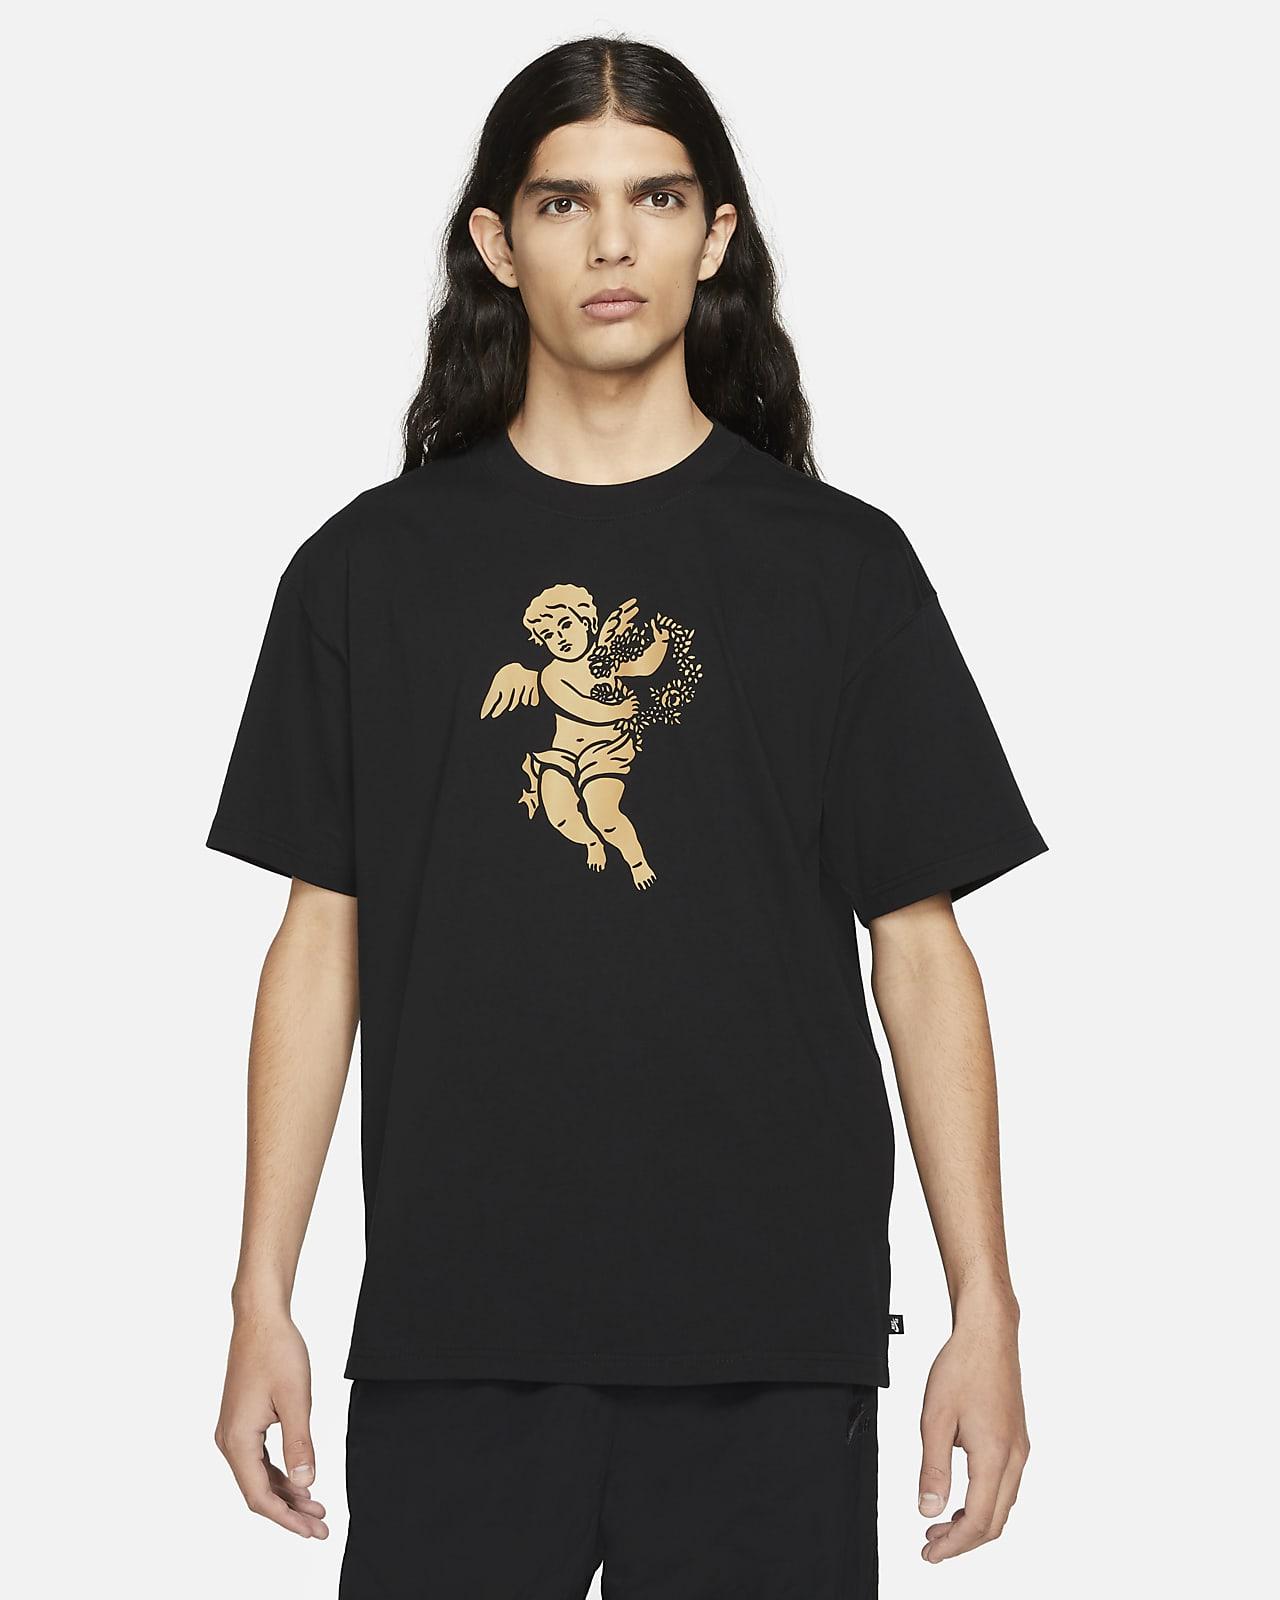 Nike SB Men's Graphic Skate T-Shirt